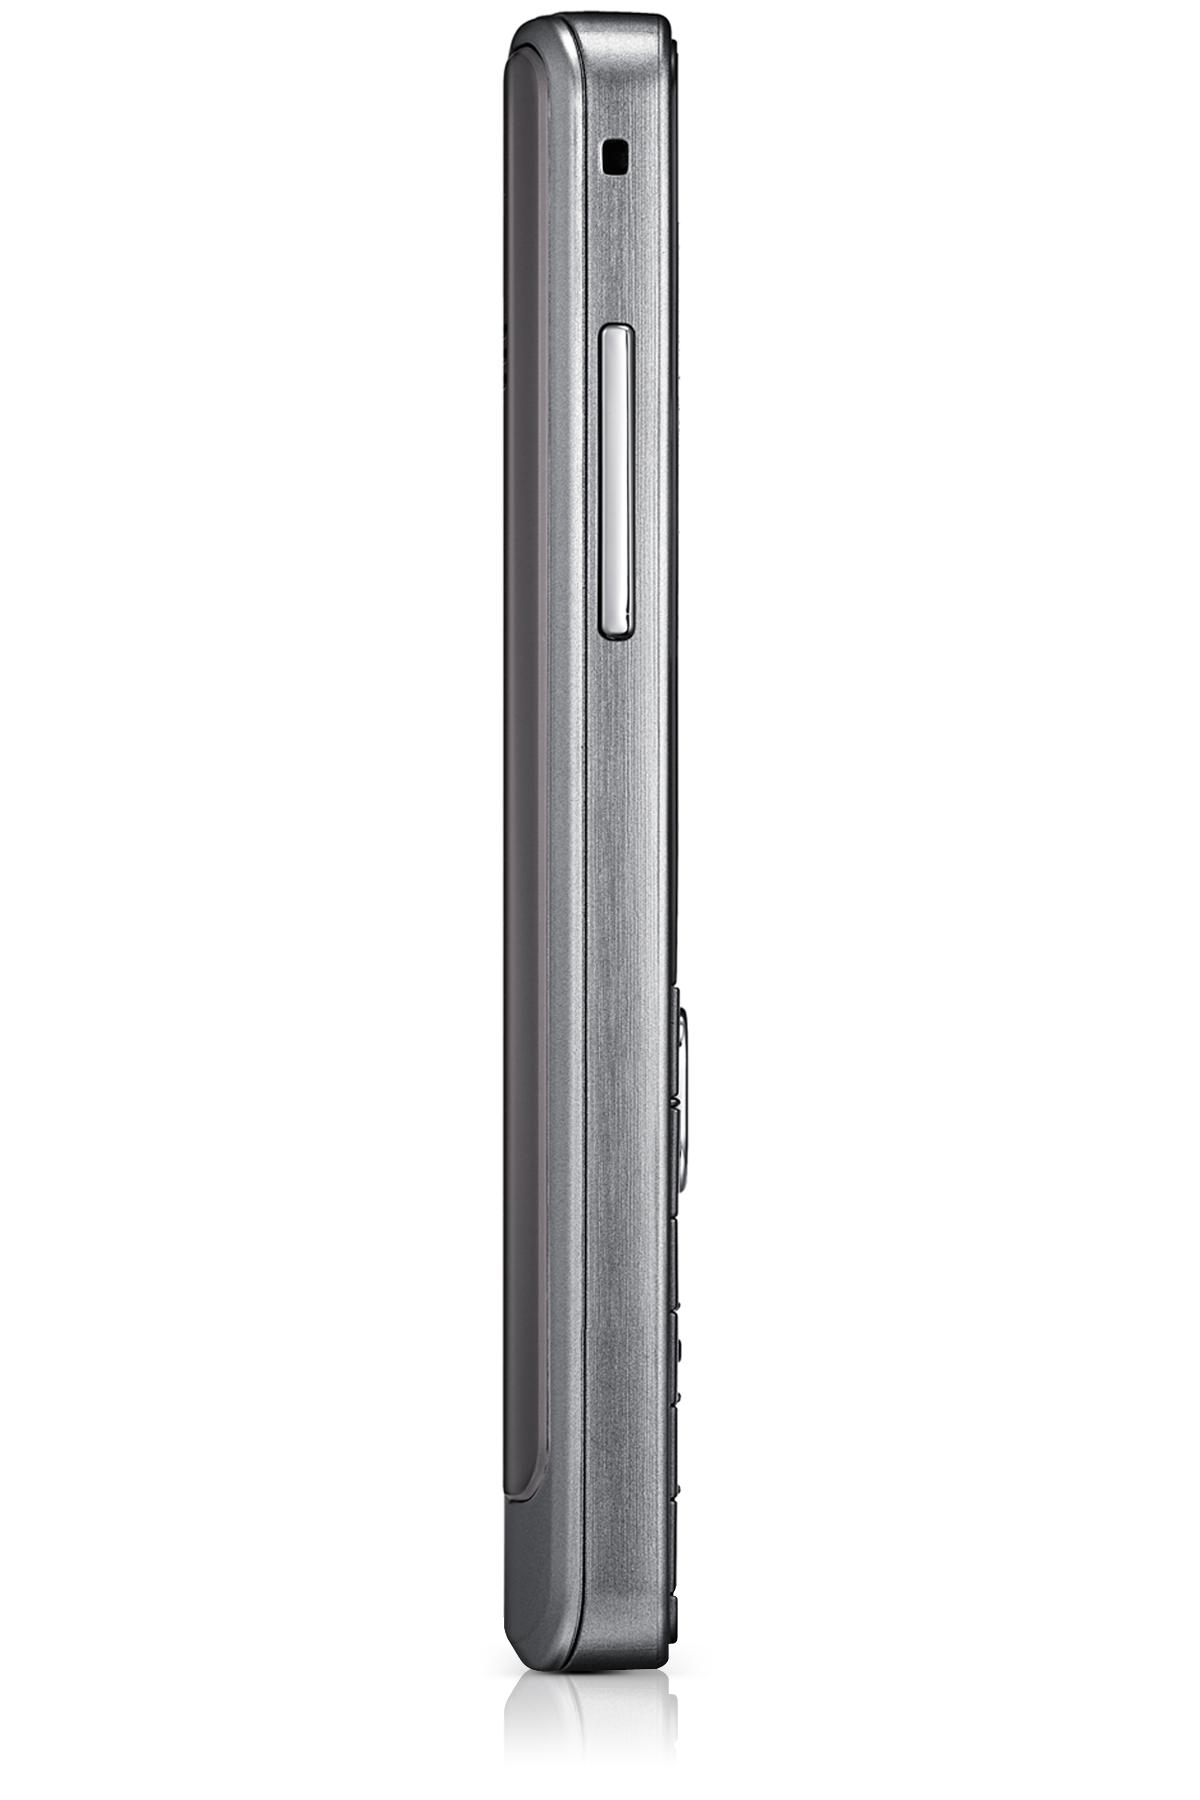 S5610